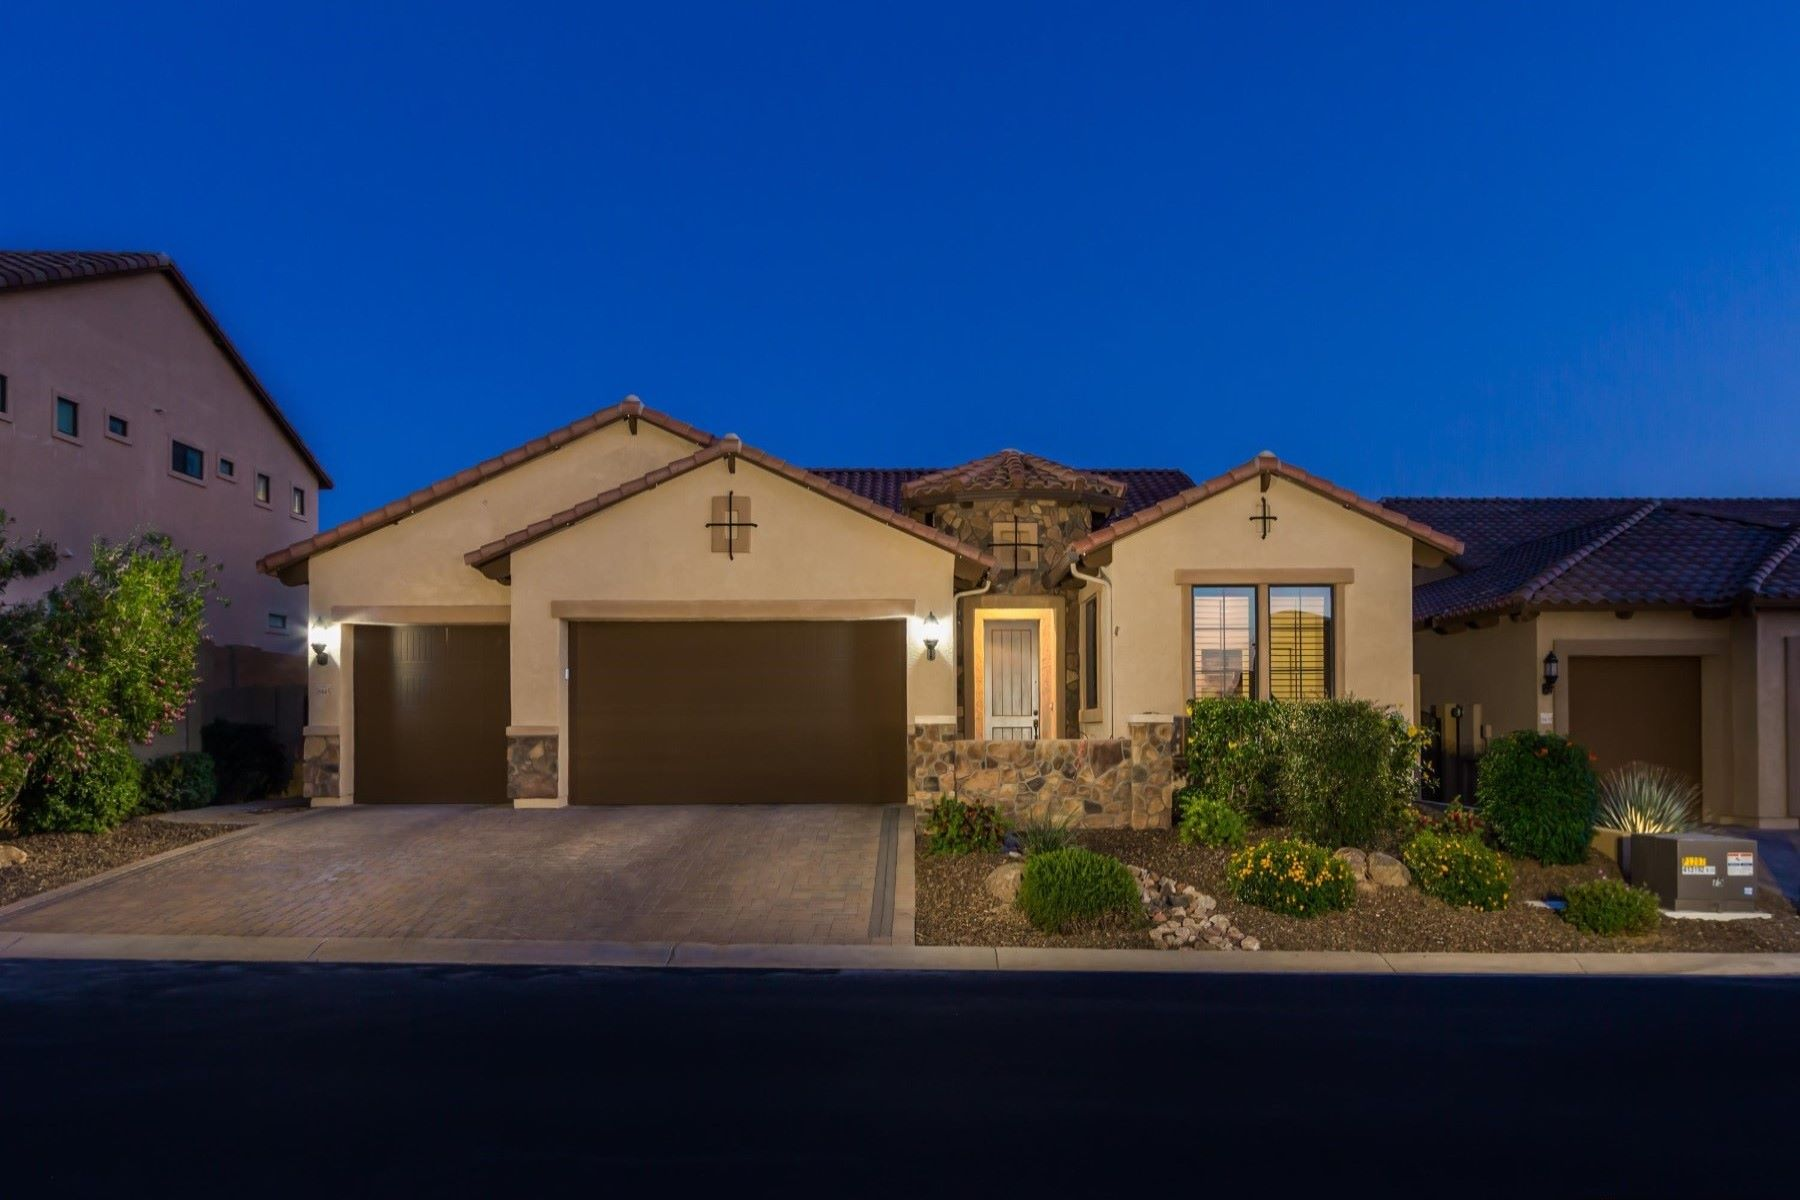 Vivienda unifamiliar por un Venta en Resort-style living in Mountain Bridge gated community 8445 E Leland St Mesa, Arizona, 85207 Estados Unidos